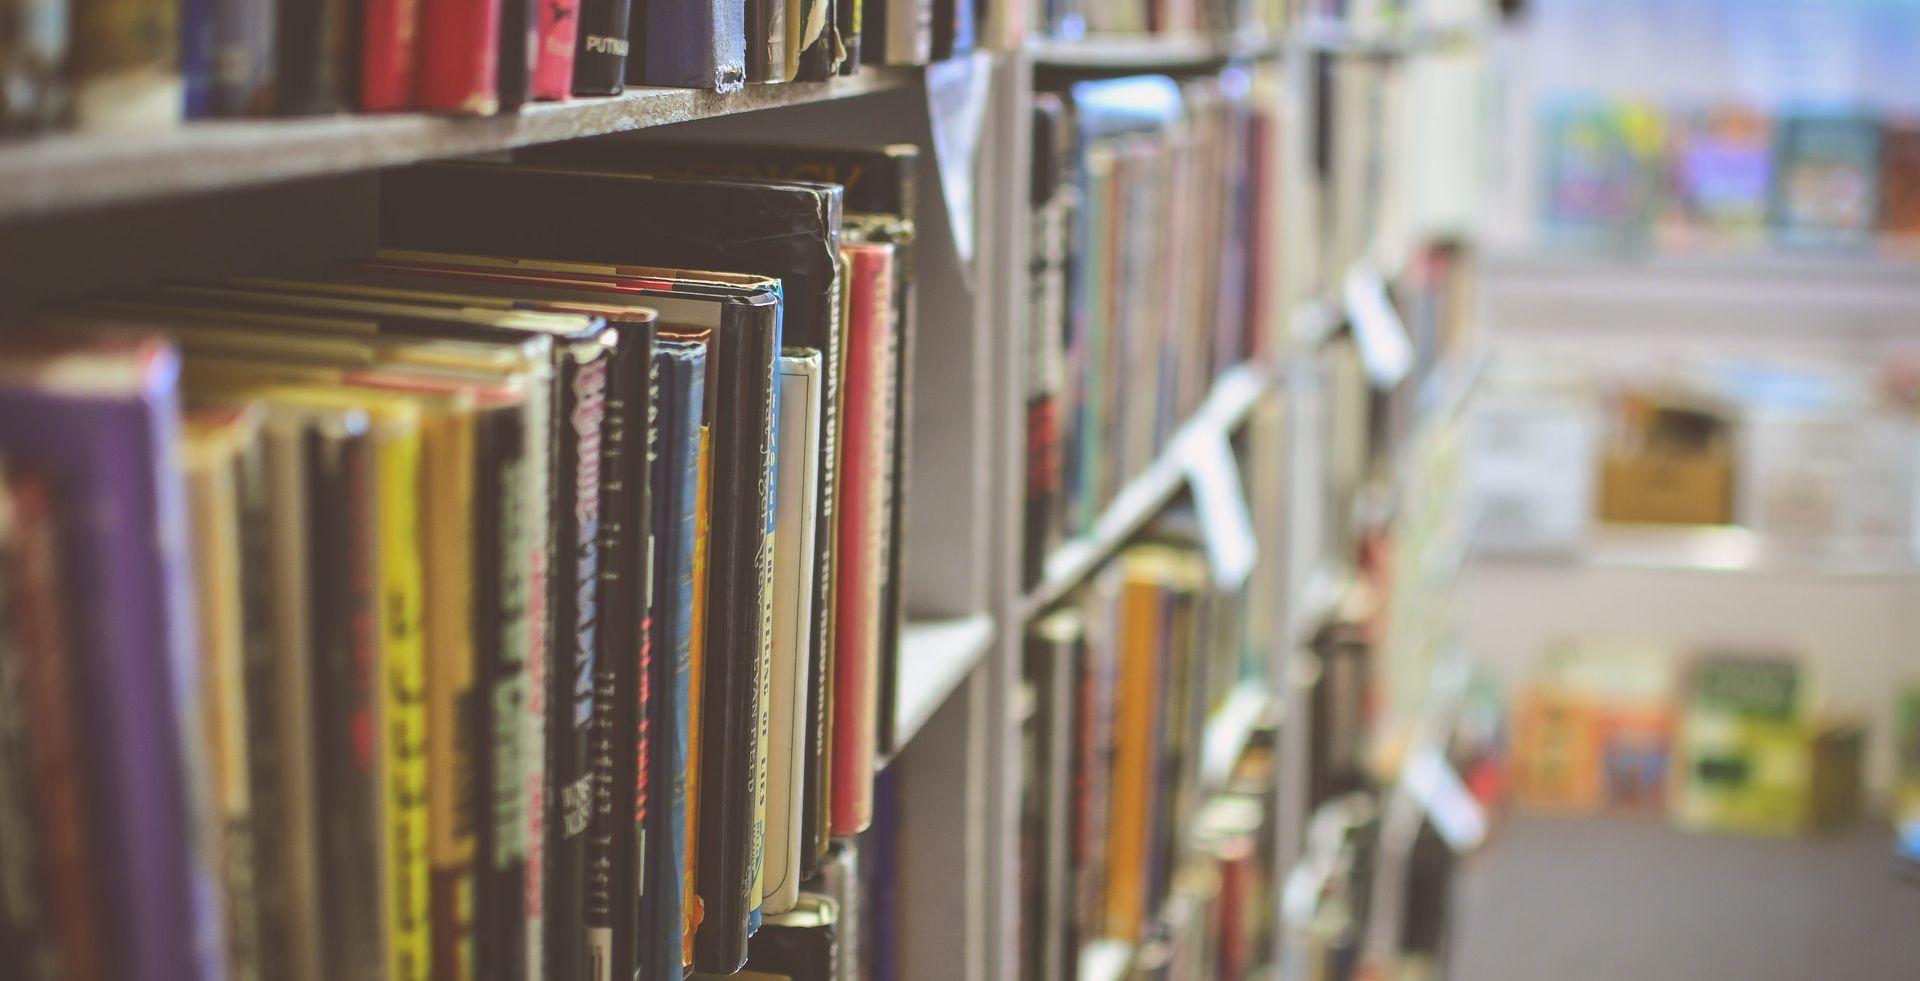 'Konstantno učenje osnovni je cilj obrazovanja'